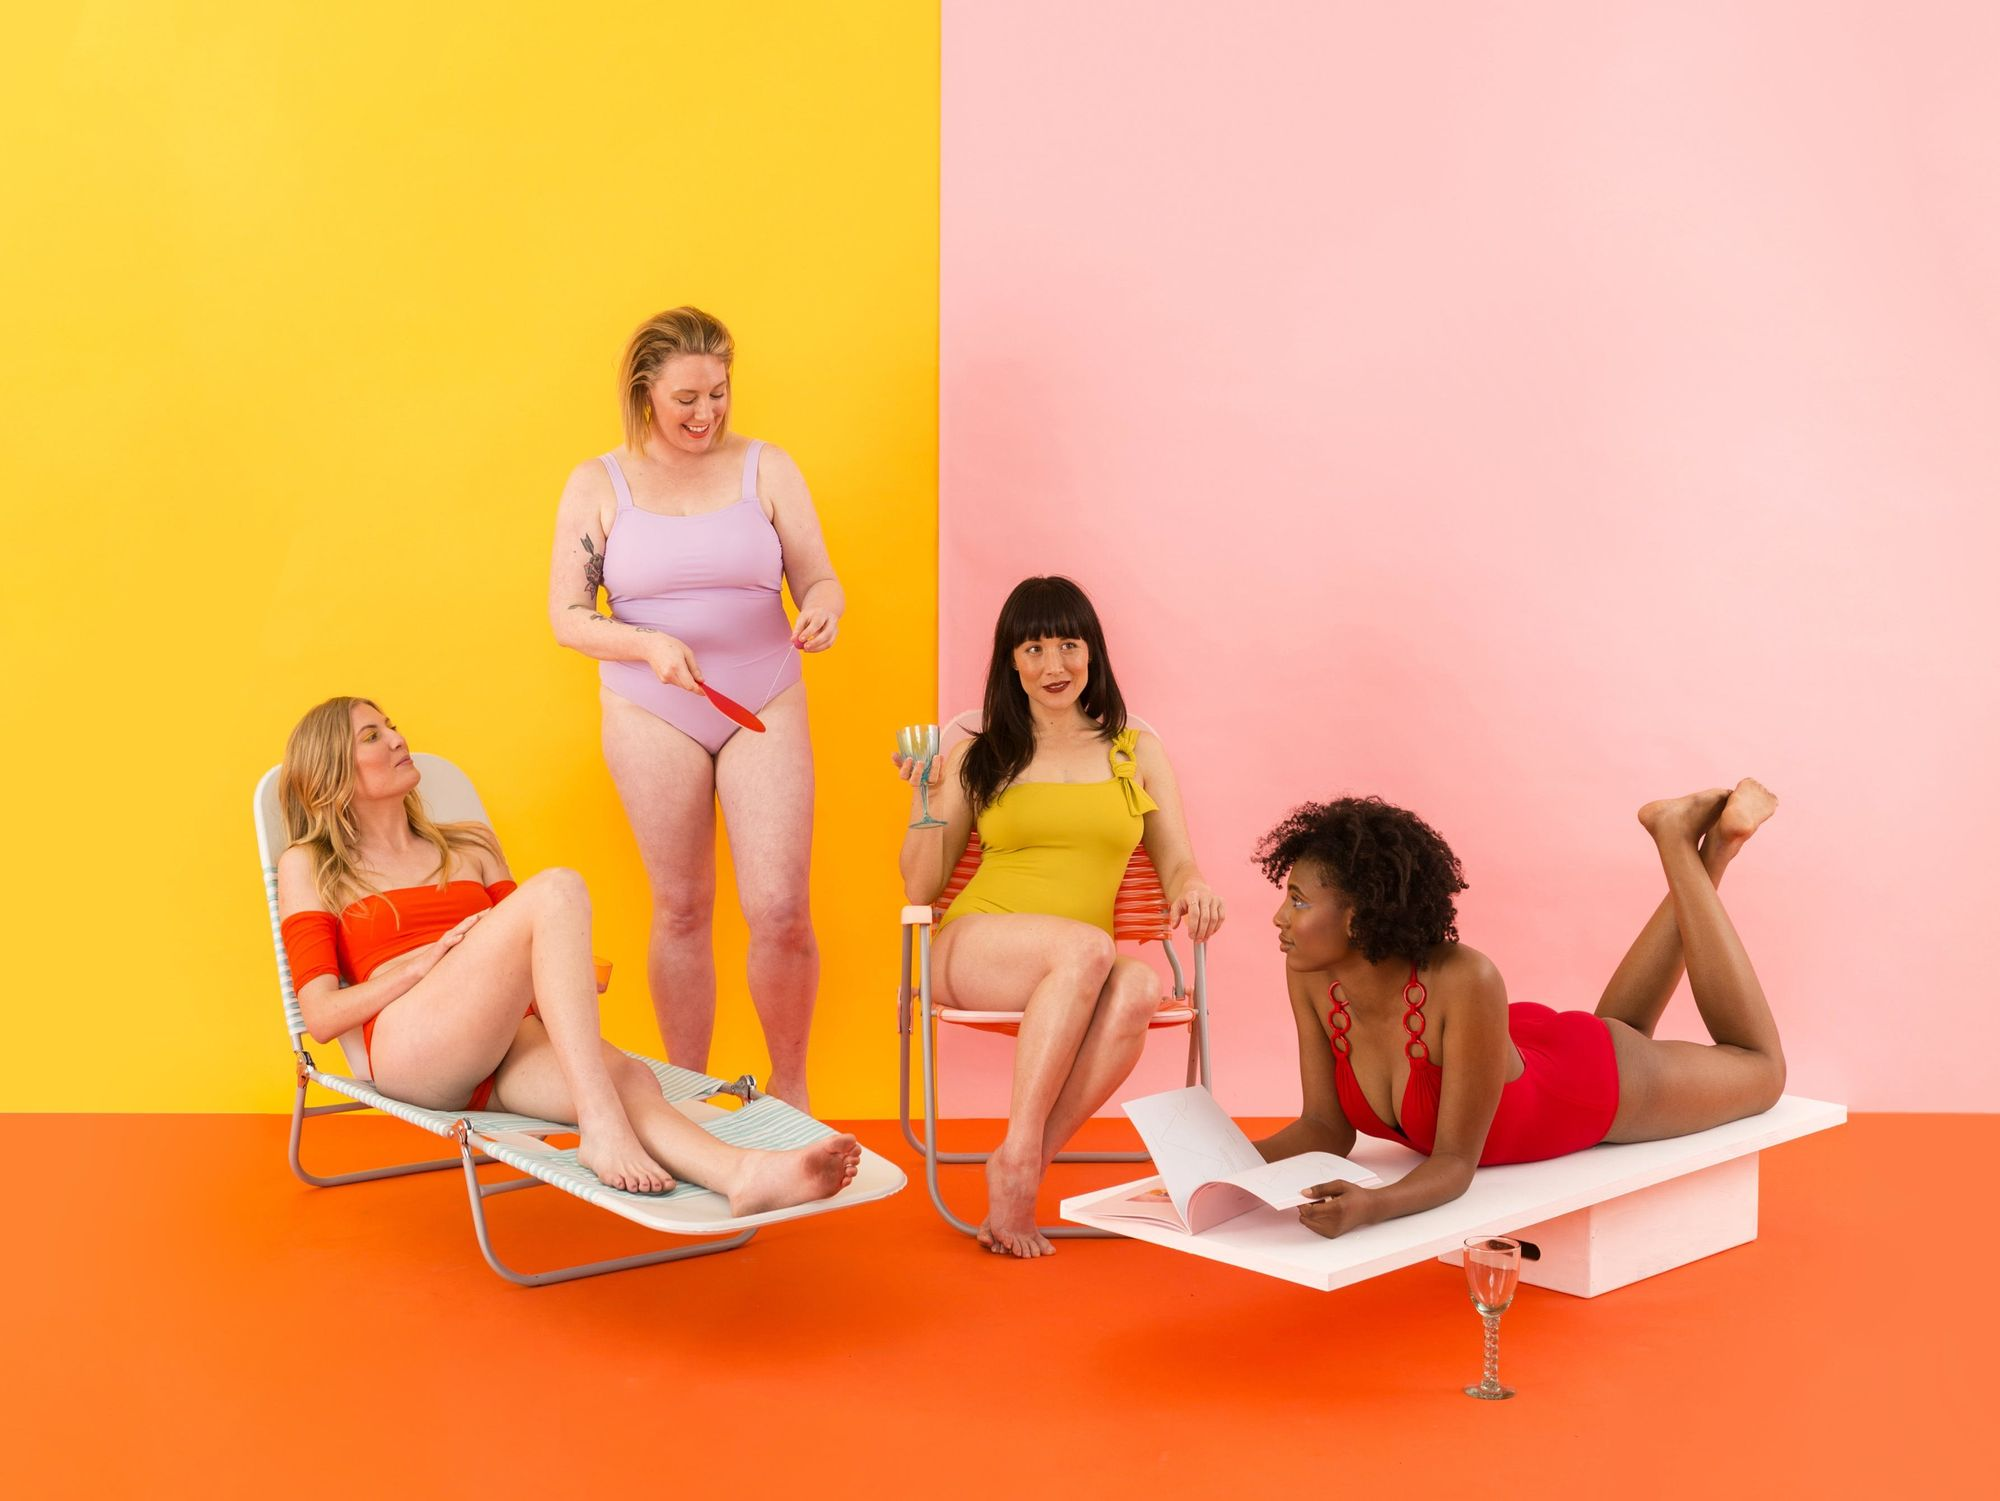 2018 Swimsuit Guide for Women